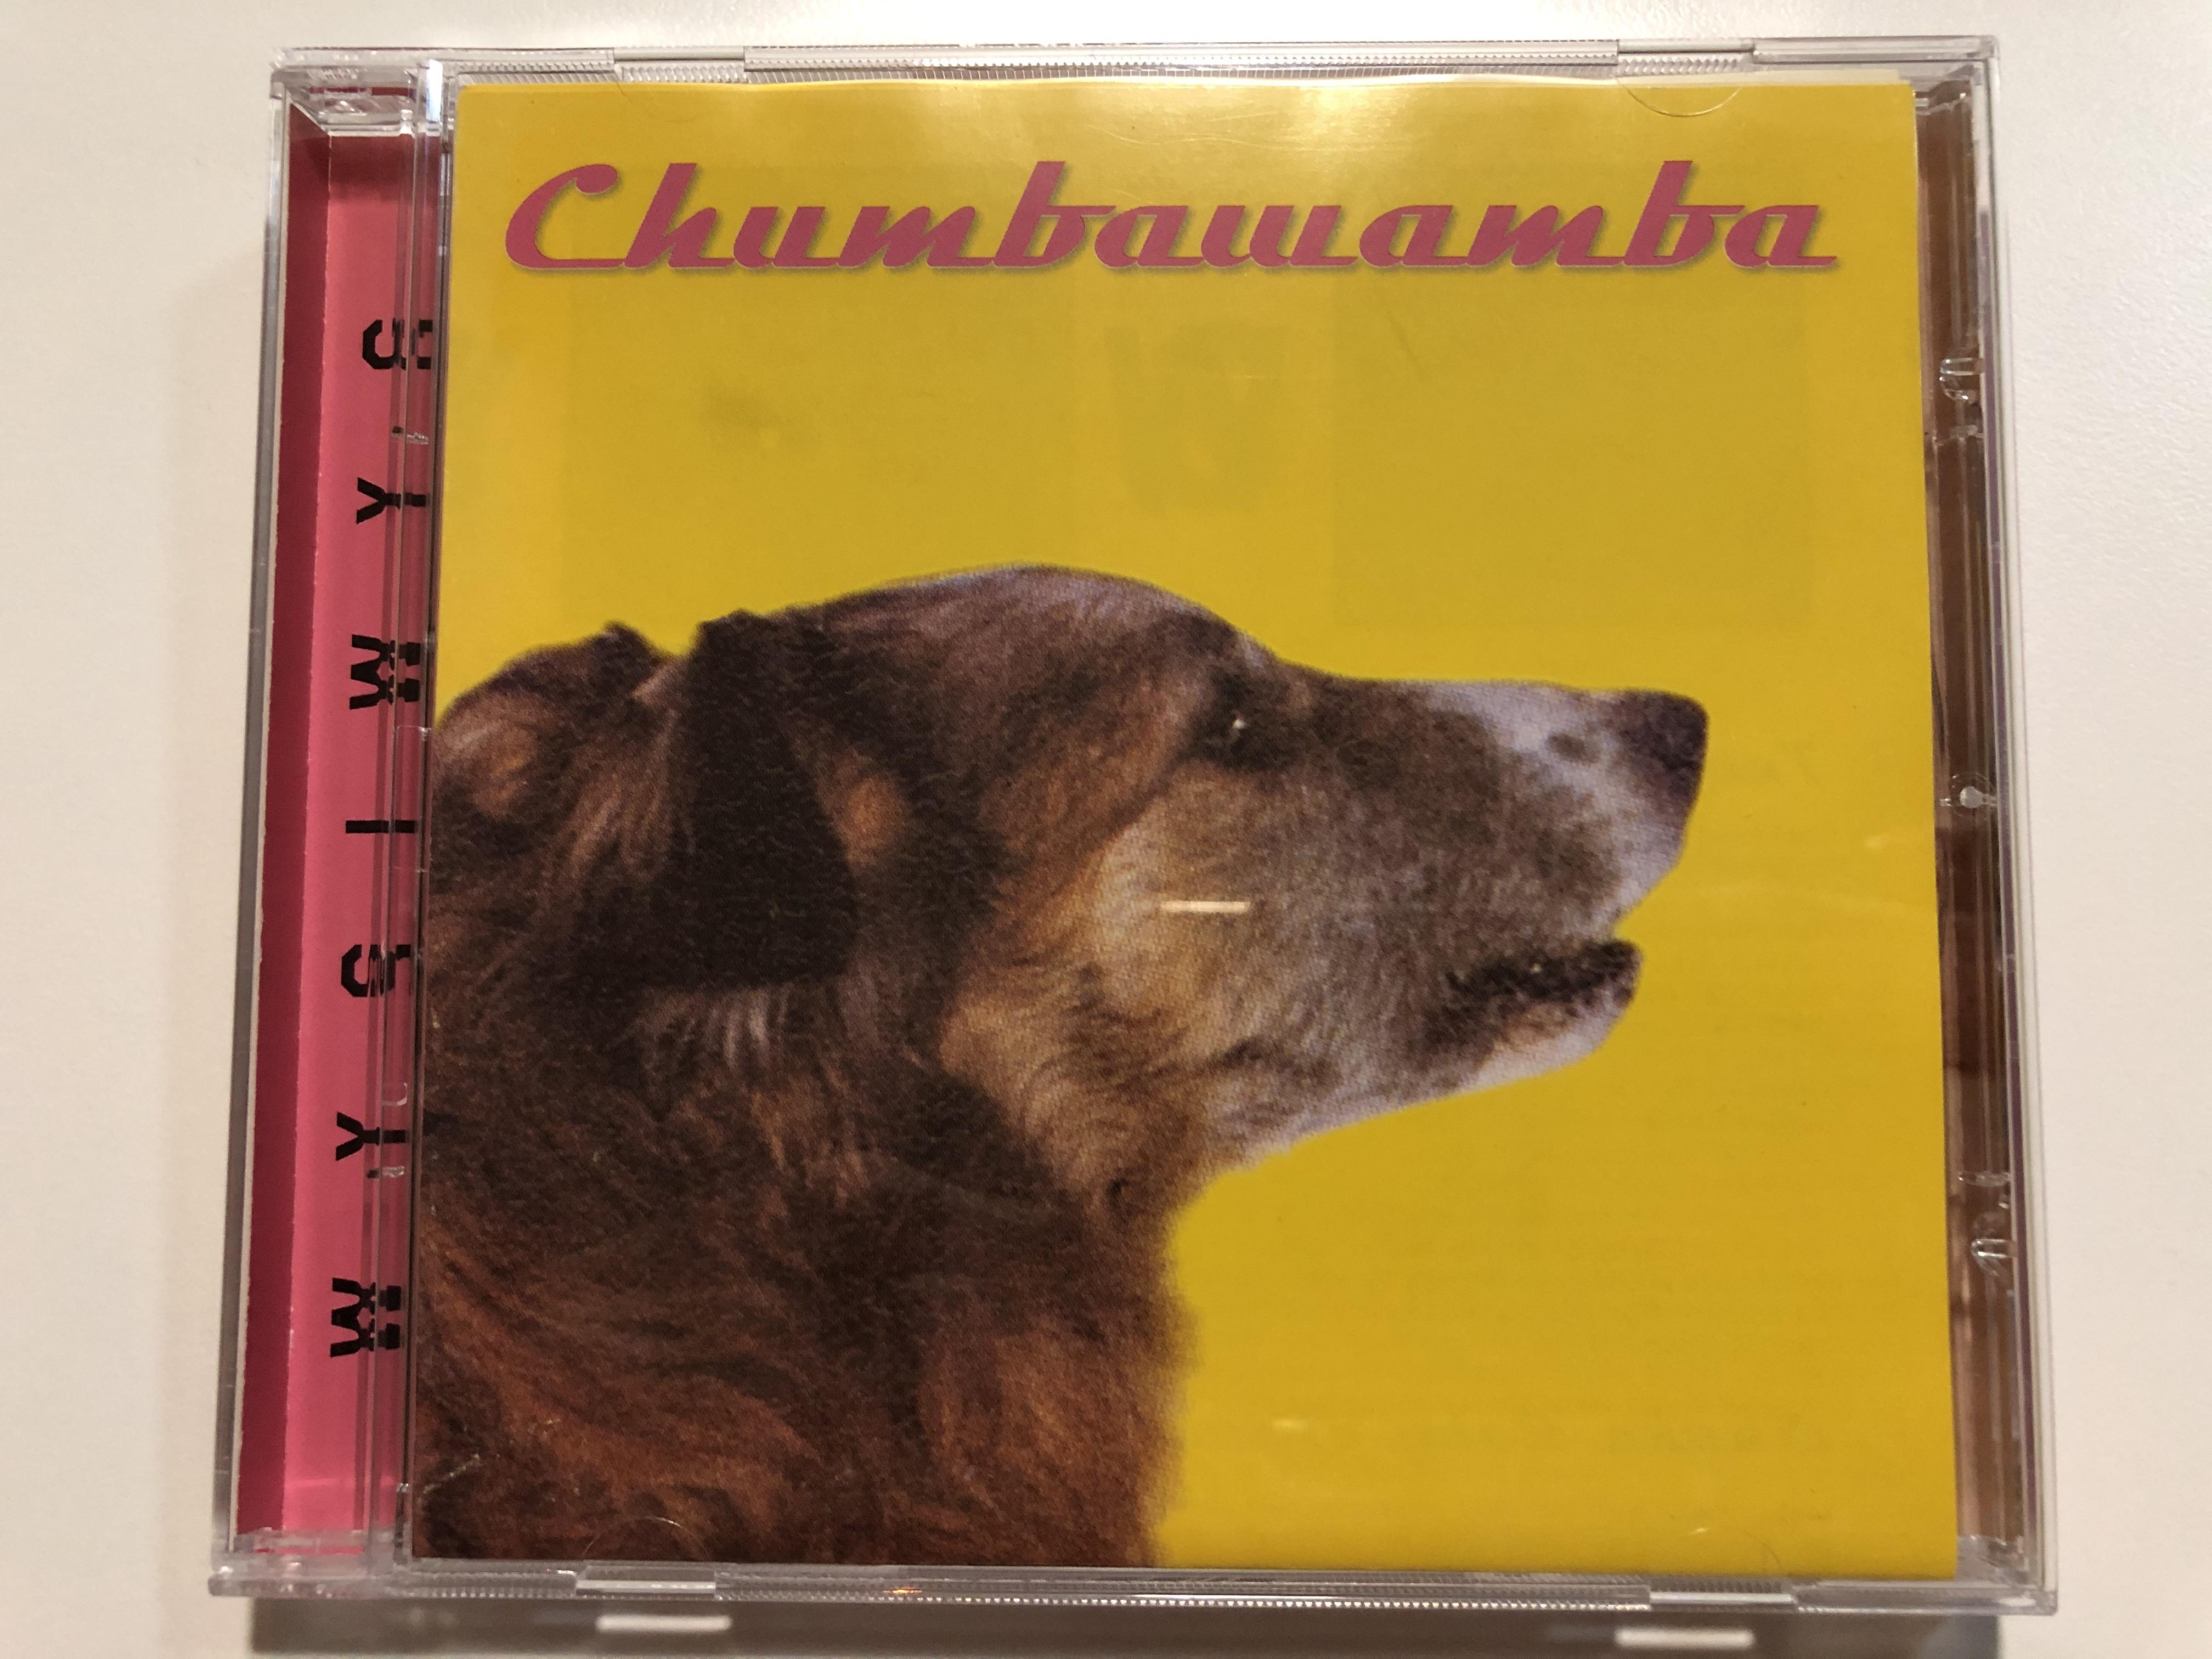 chumbawamba-wysiwyg-emi-electrola-audio-cd-2000-724352496822-1-.jpg